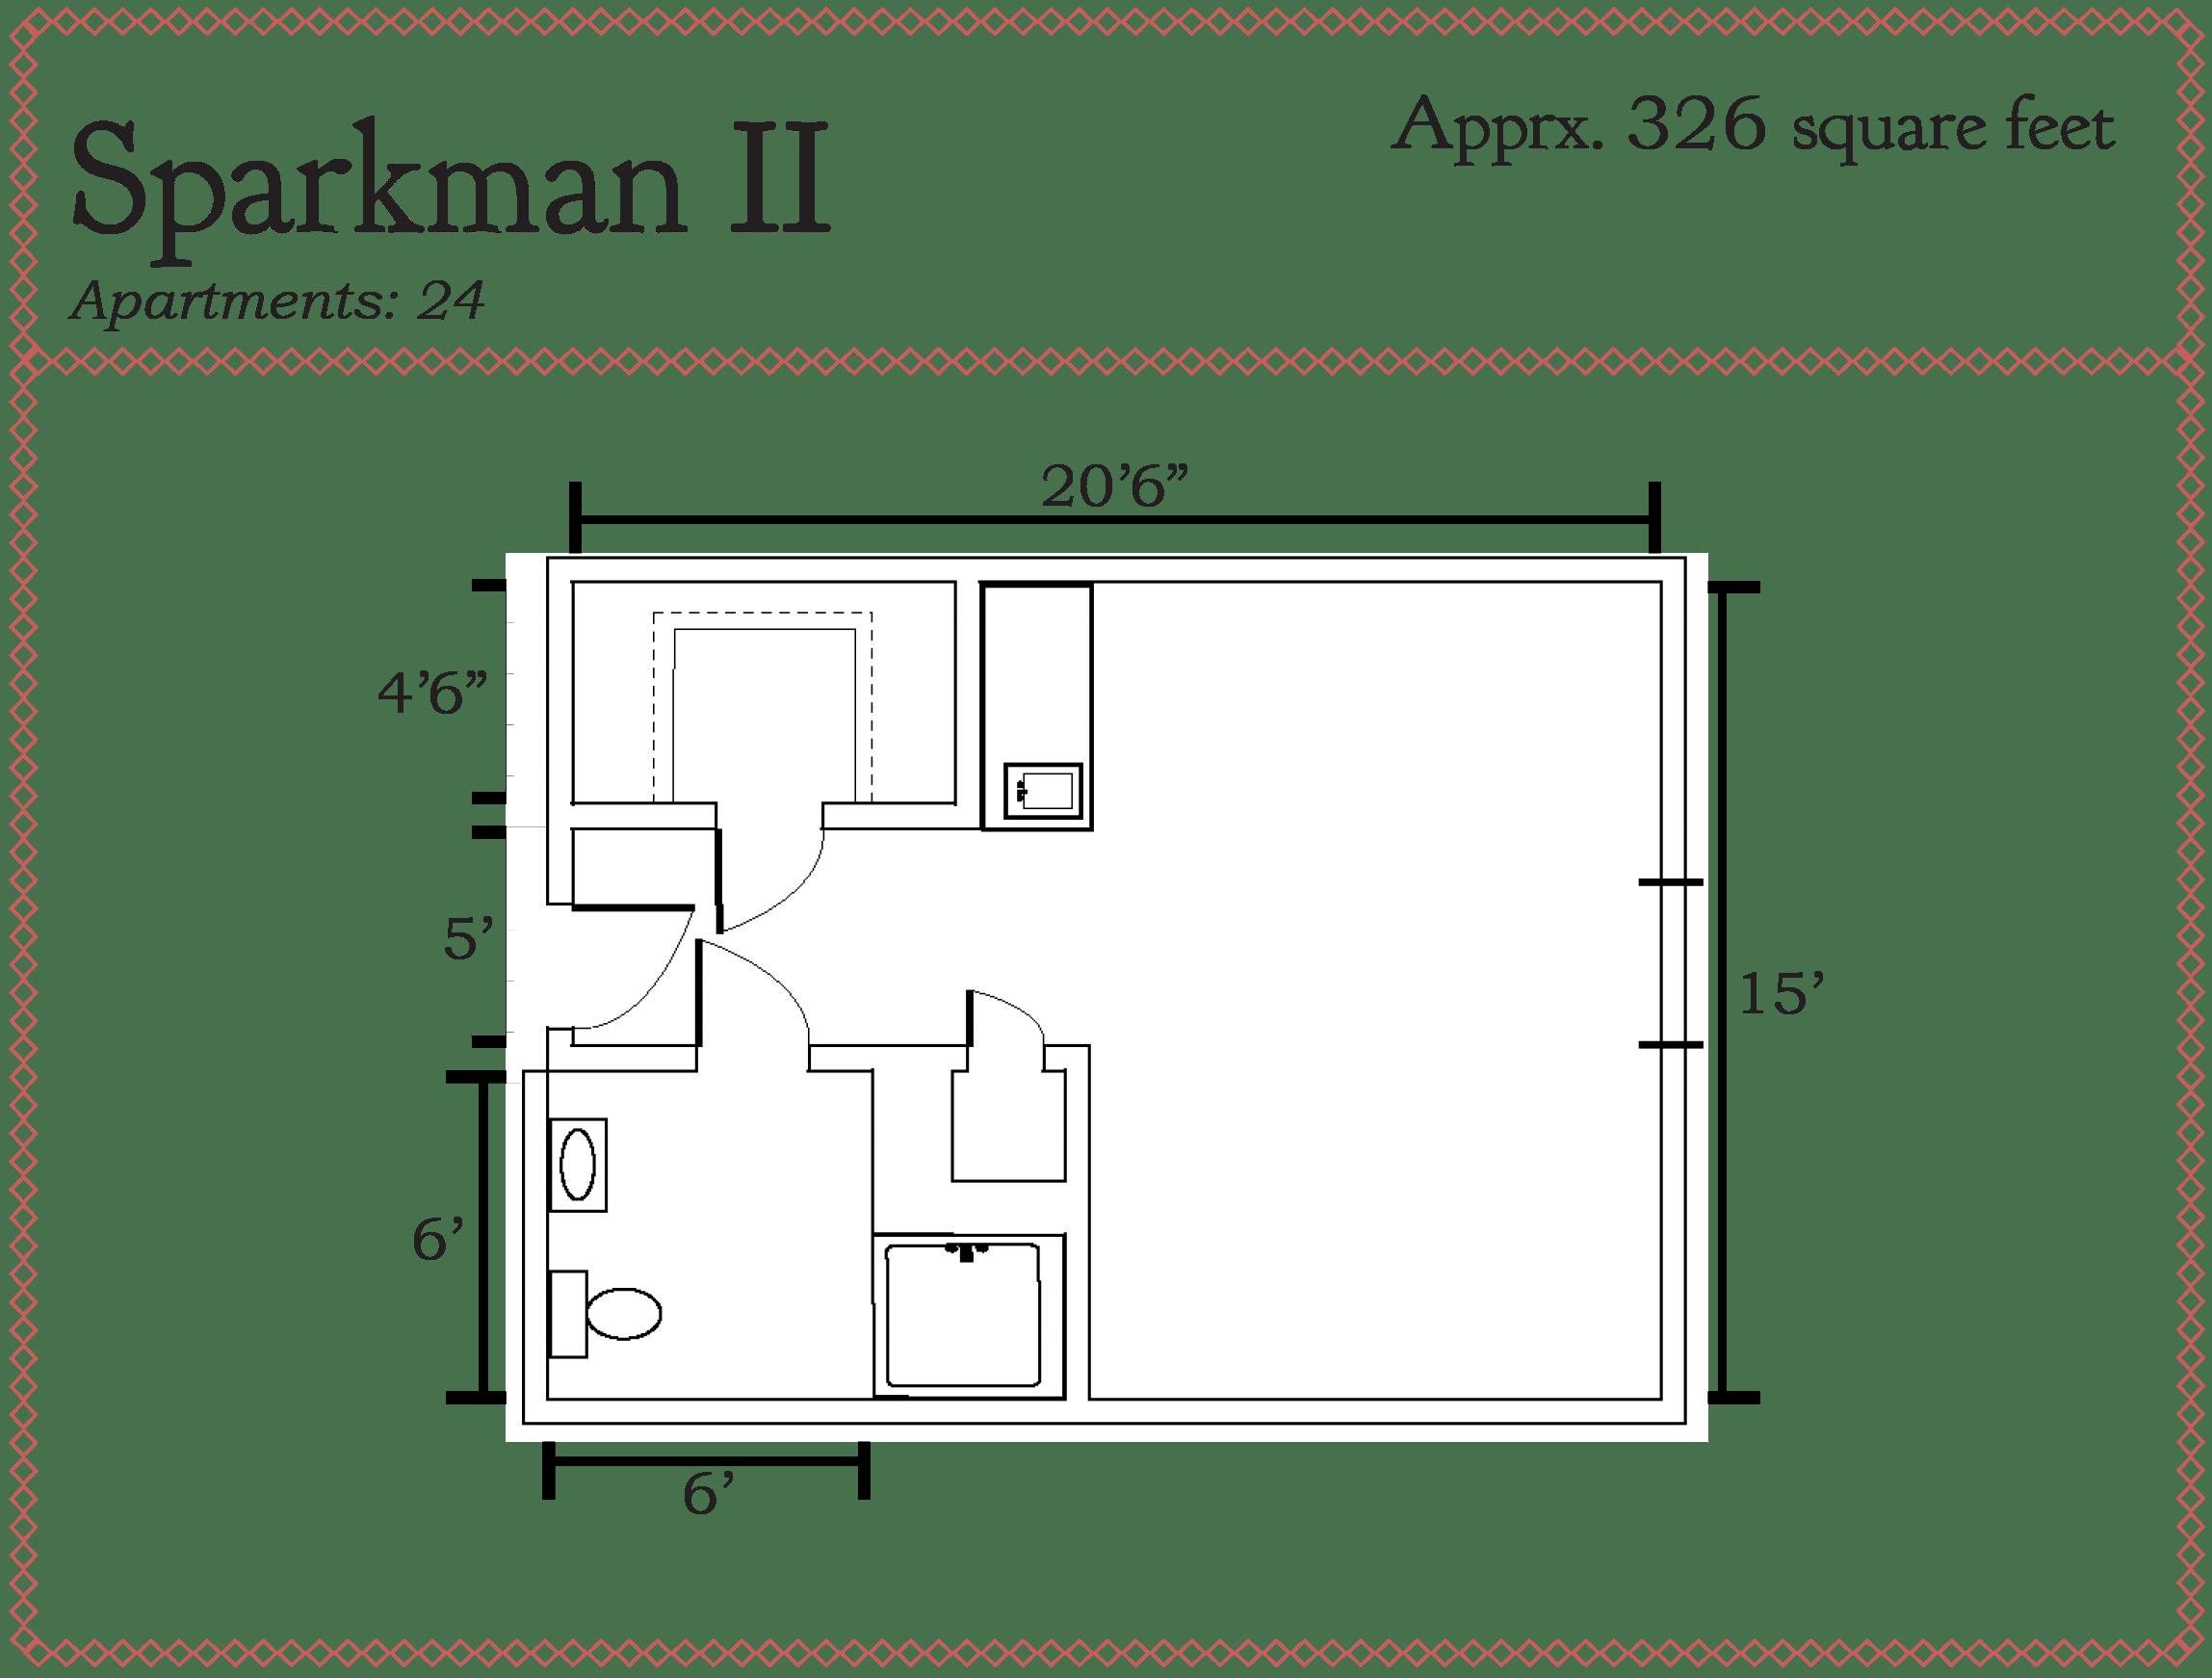 Sparkman II